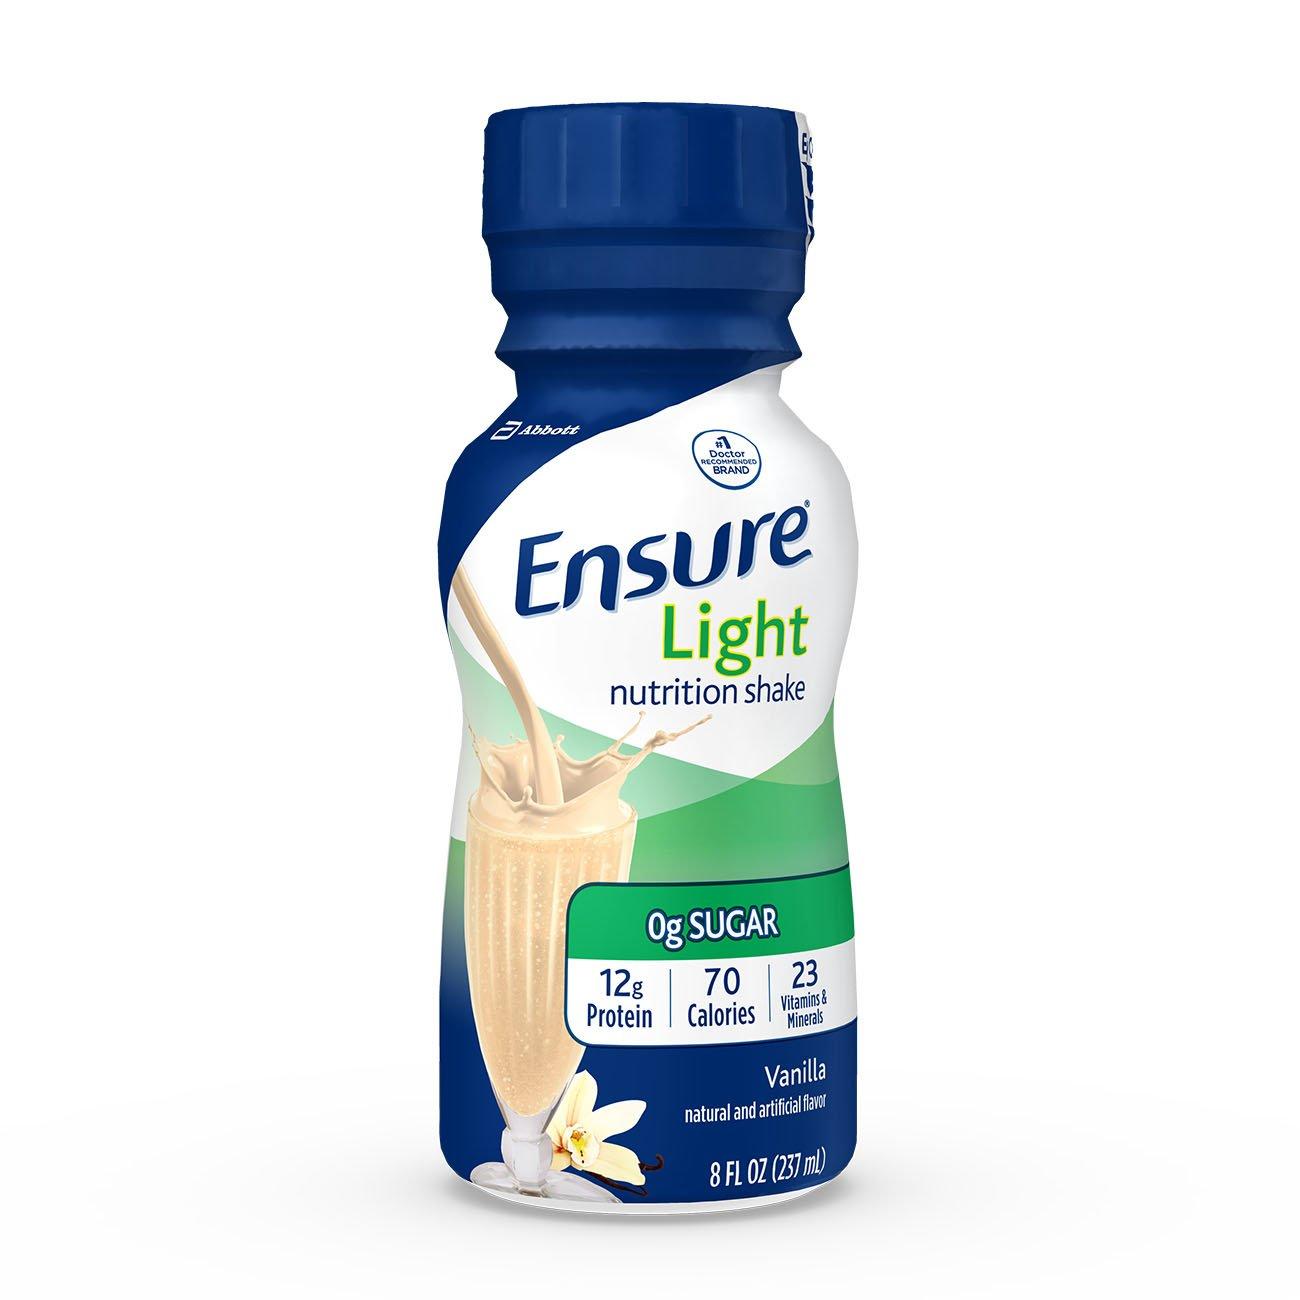 Ensure Light Nutrition Shake, 12g of high-quality protein, 0g Sugar, 2g Fat, Vanilla, 8 fl oz, 24 Count by Ensure Light